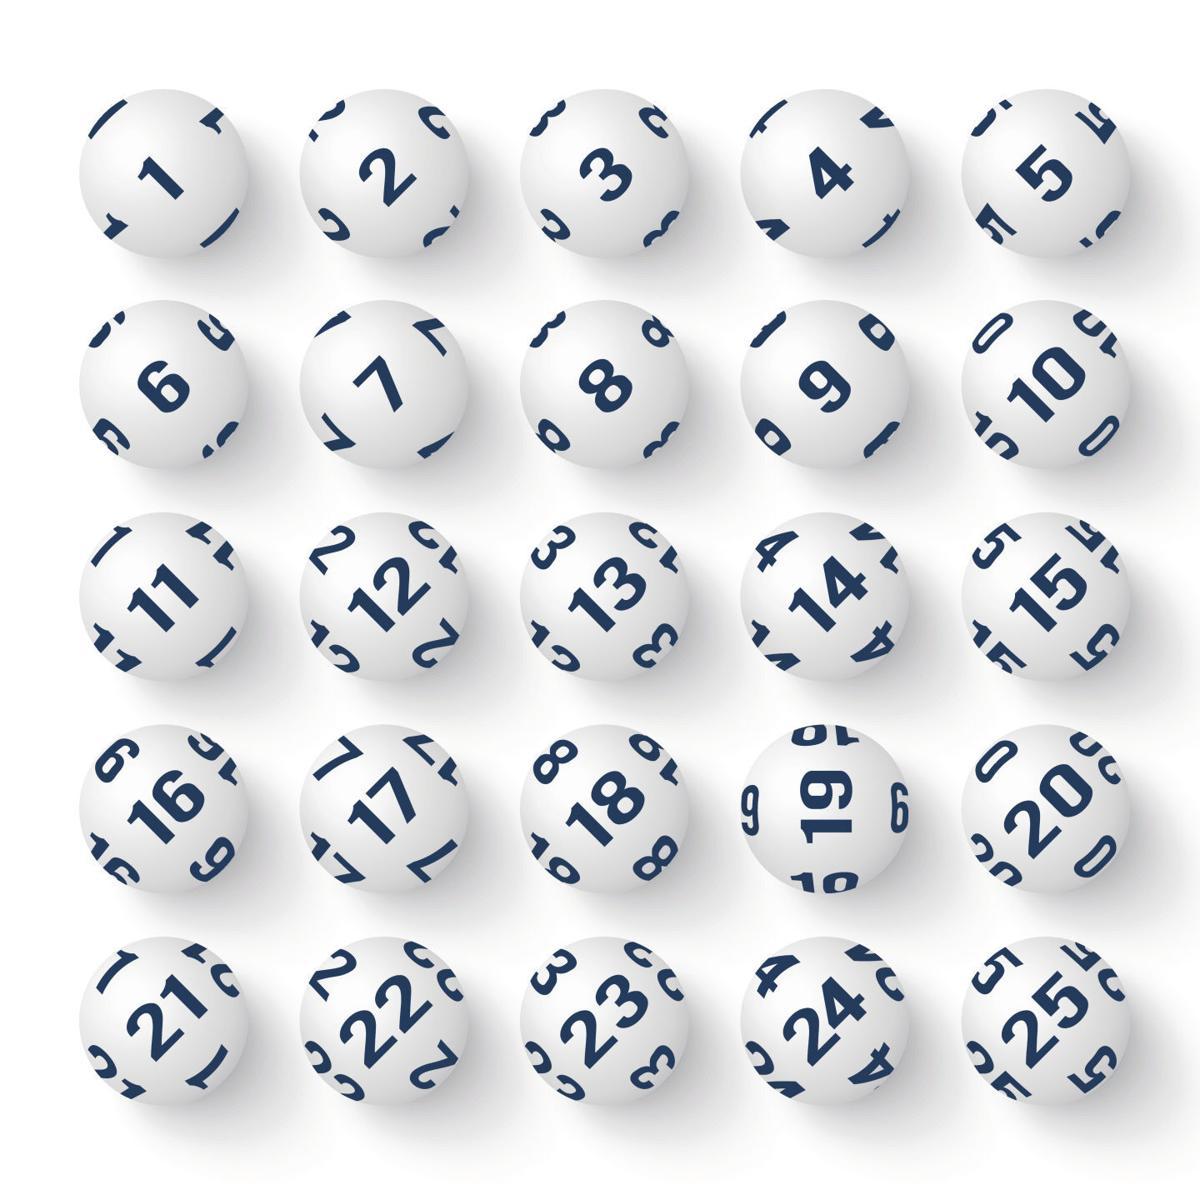 Keno balls